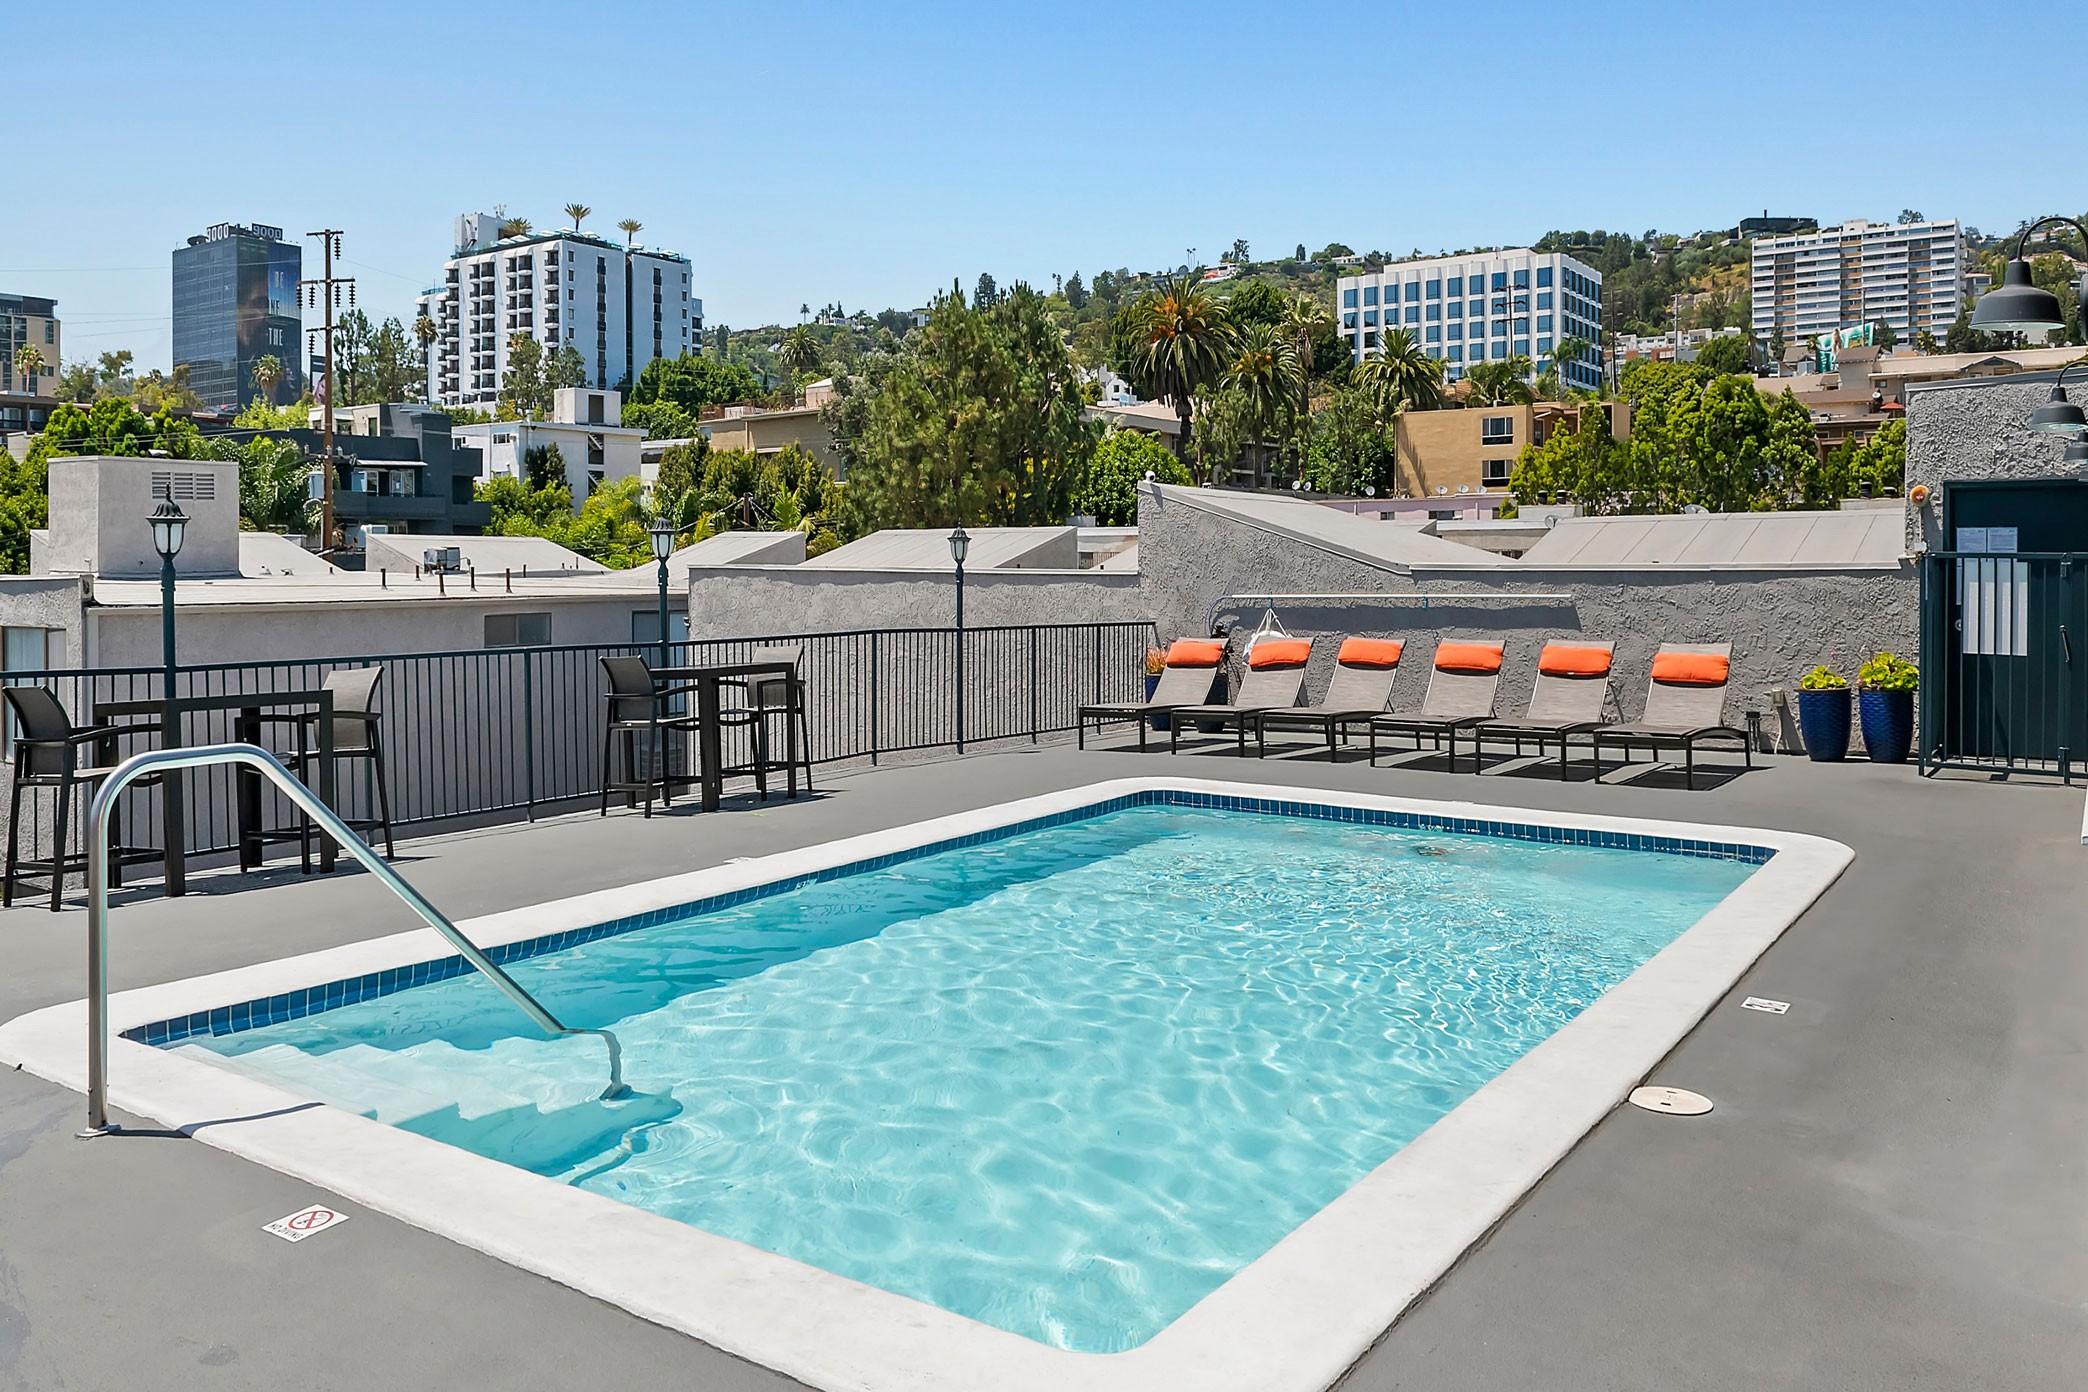 Apartments Near UCLA Villa Francisca for University of California - Los Angeles Students in Los Angeles, CA